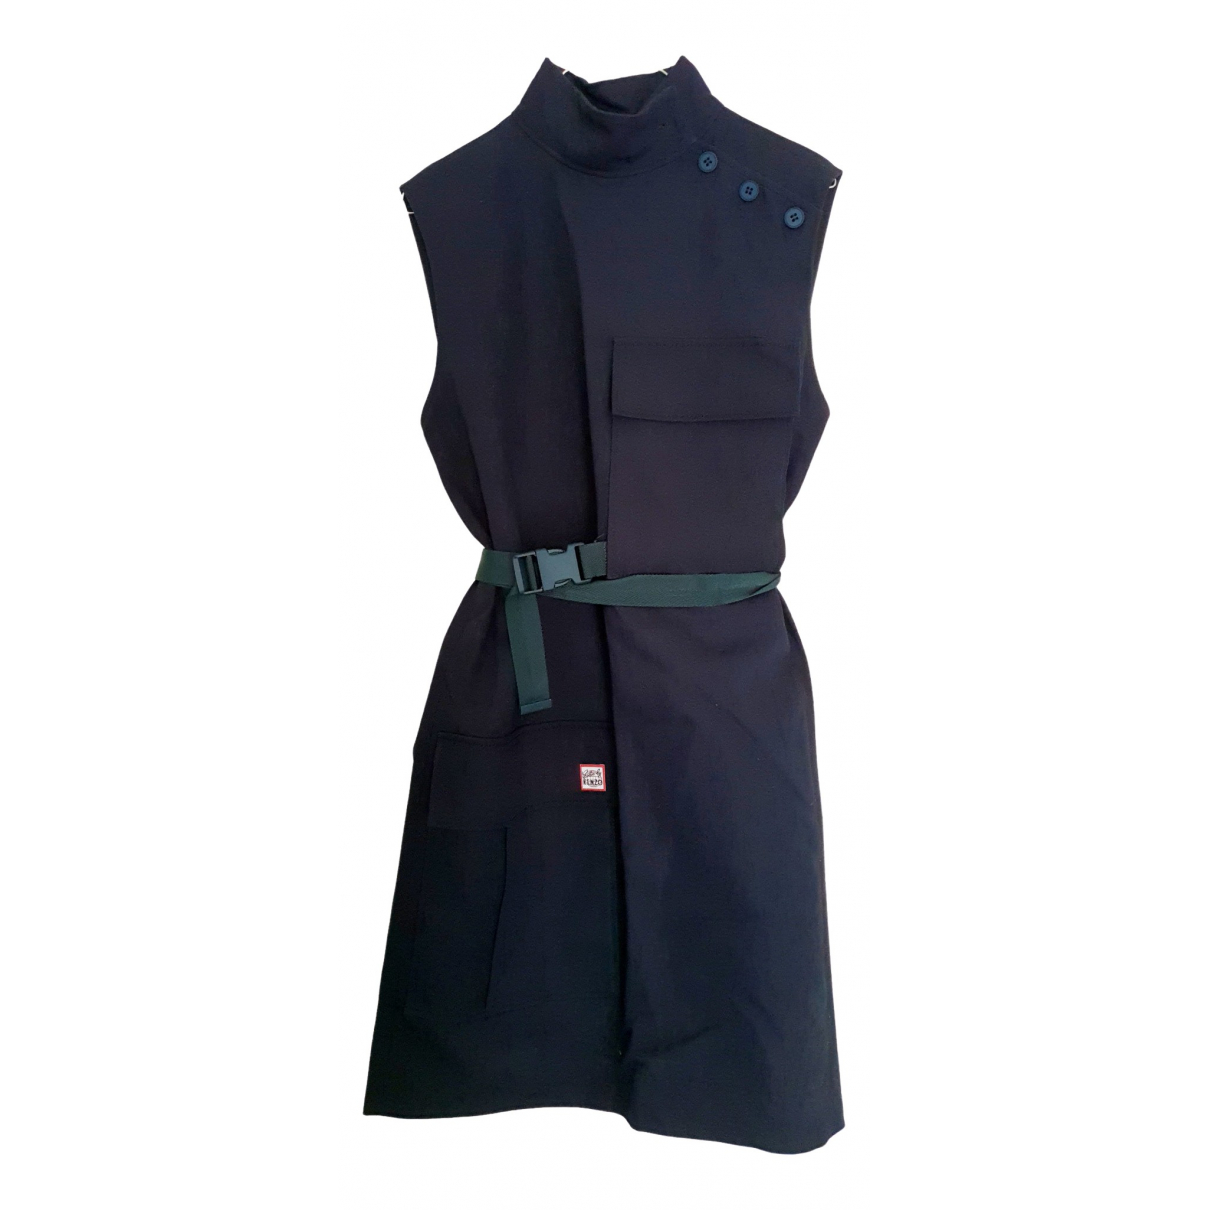 Kenzo \N Navy Cotton dress for Women 38 FR